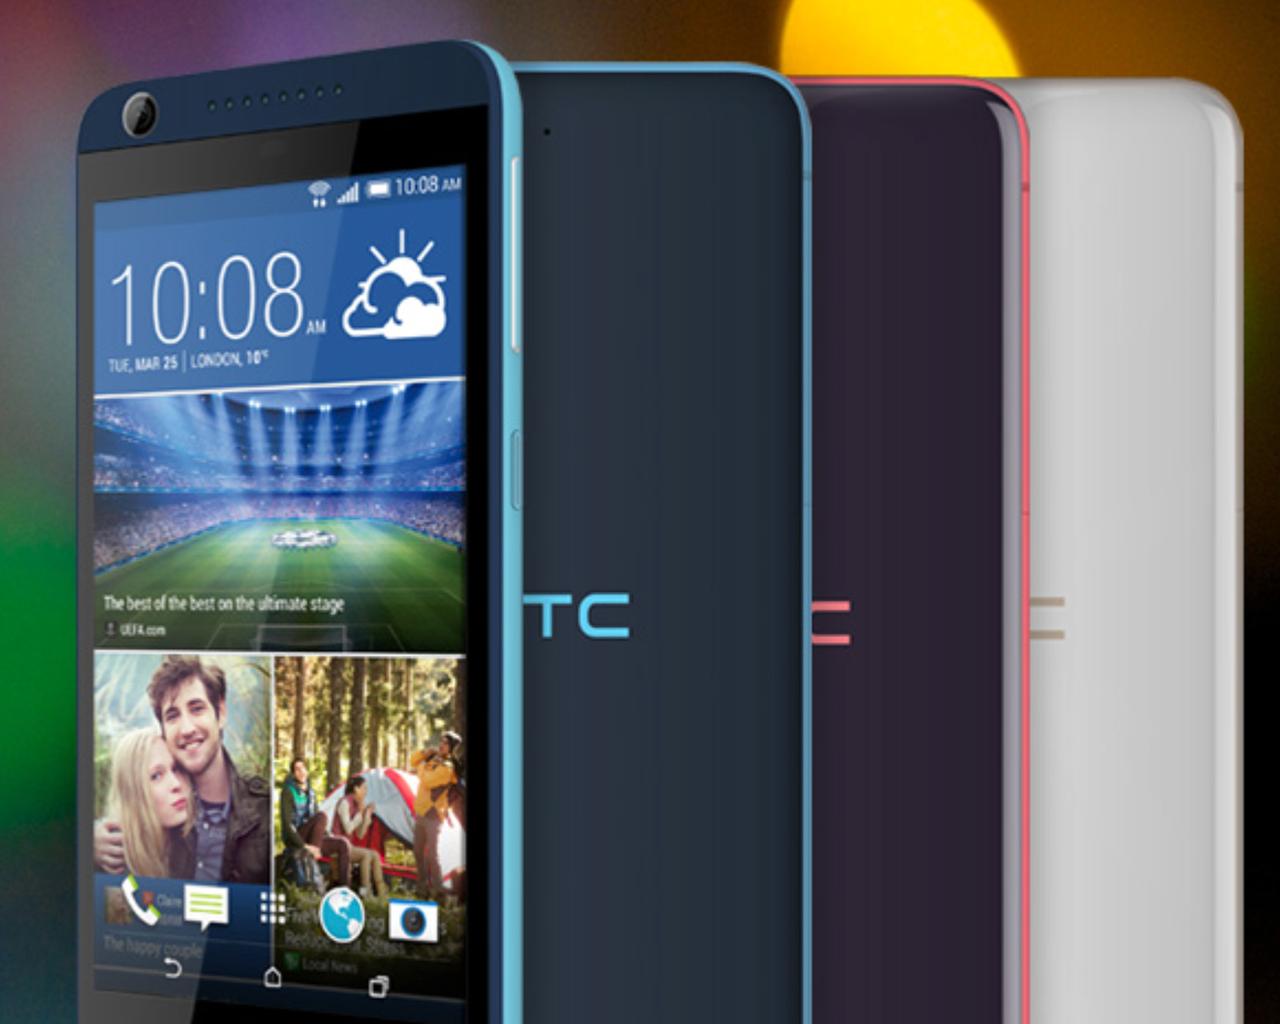 HTC Desire 626G Dual SIM Smartphone Review